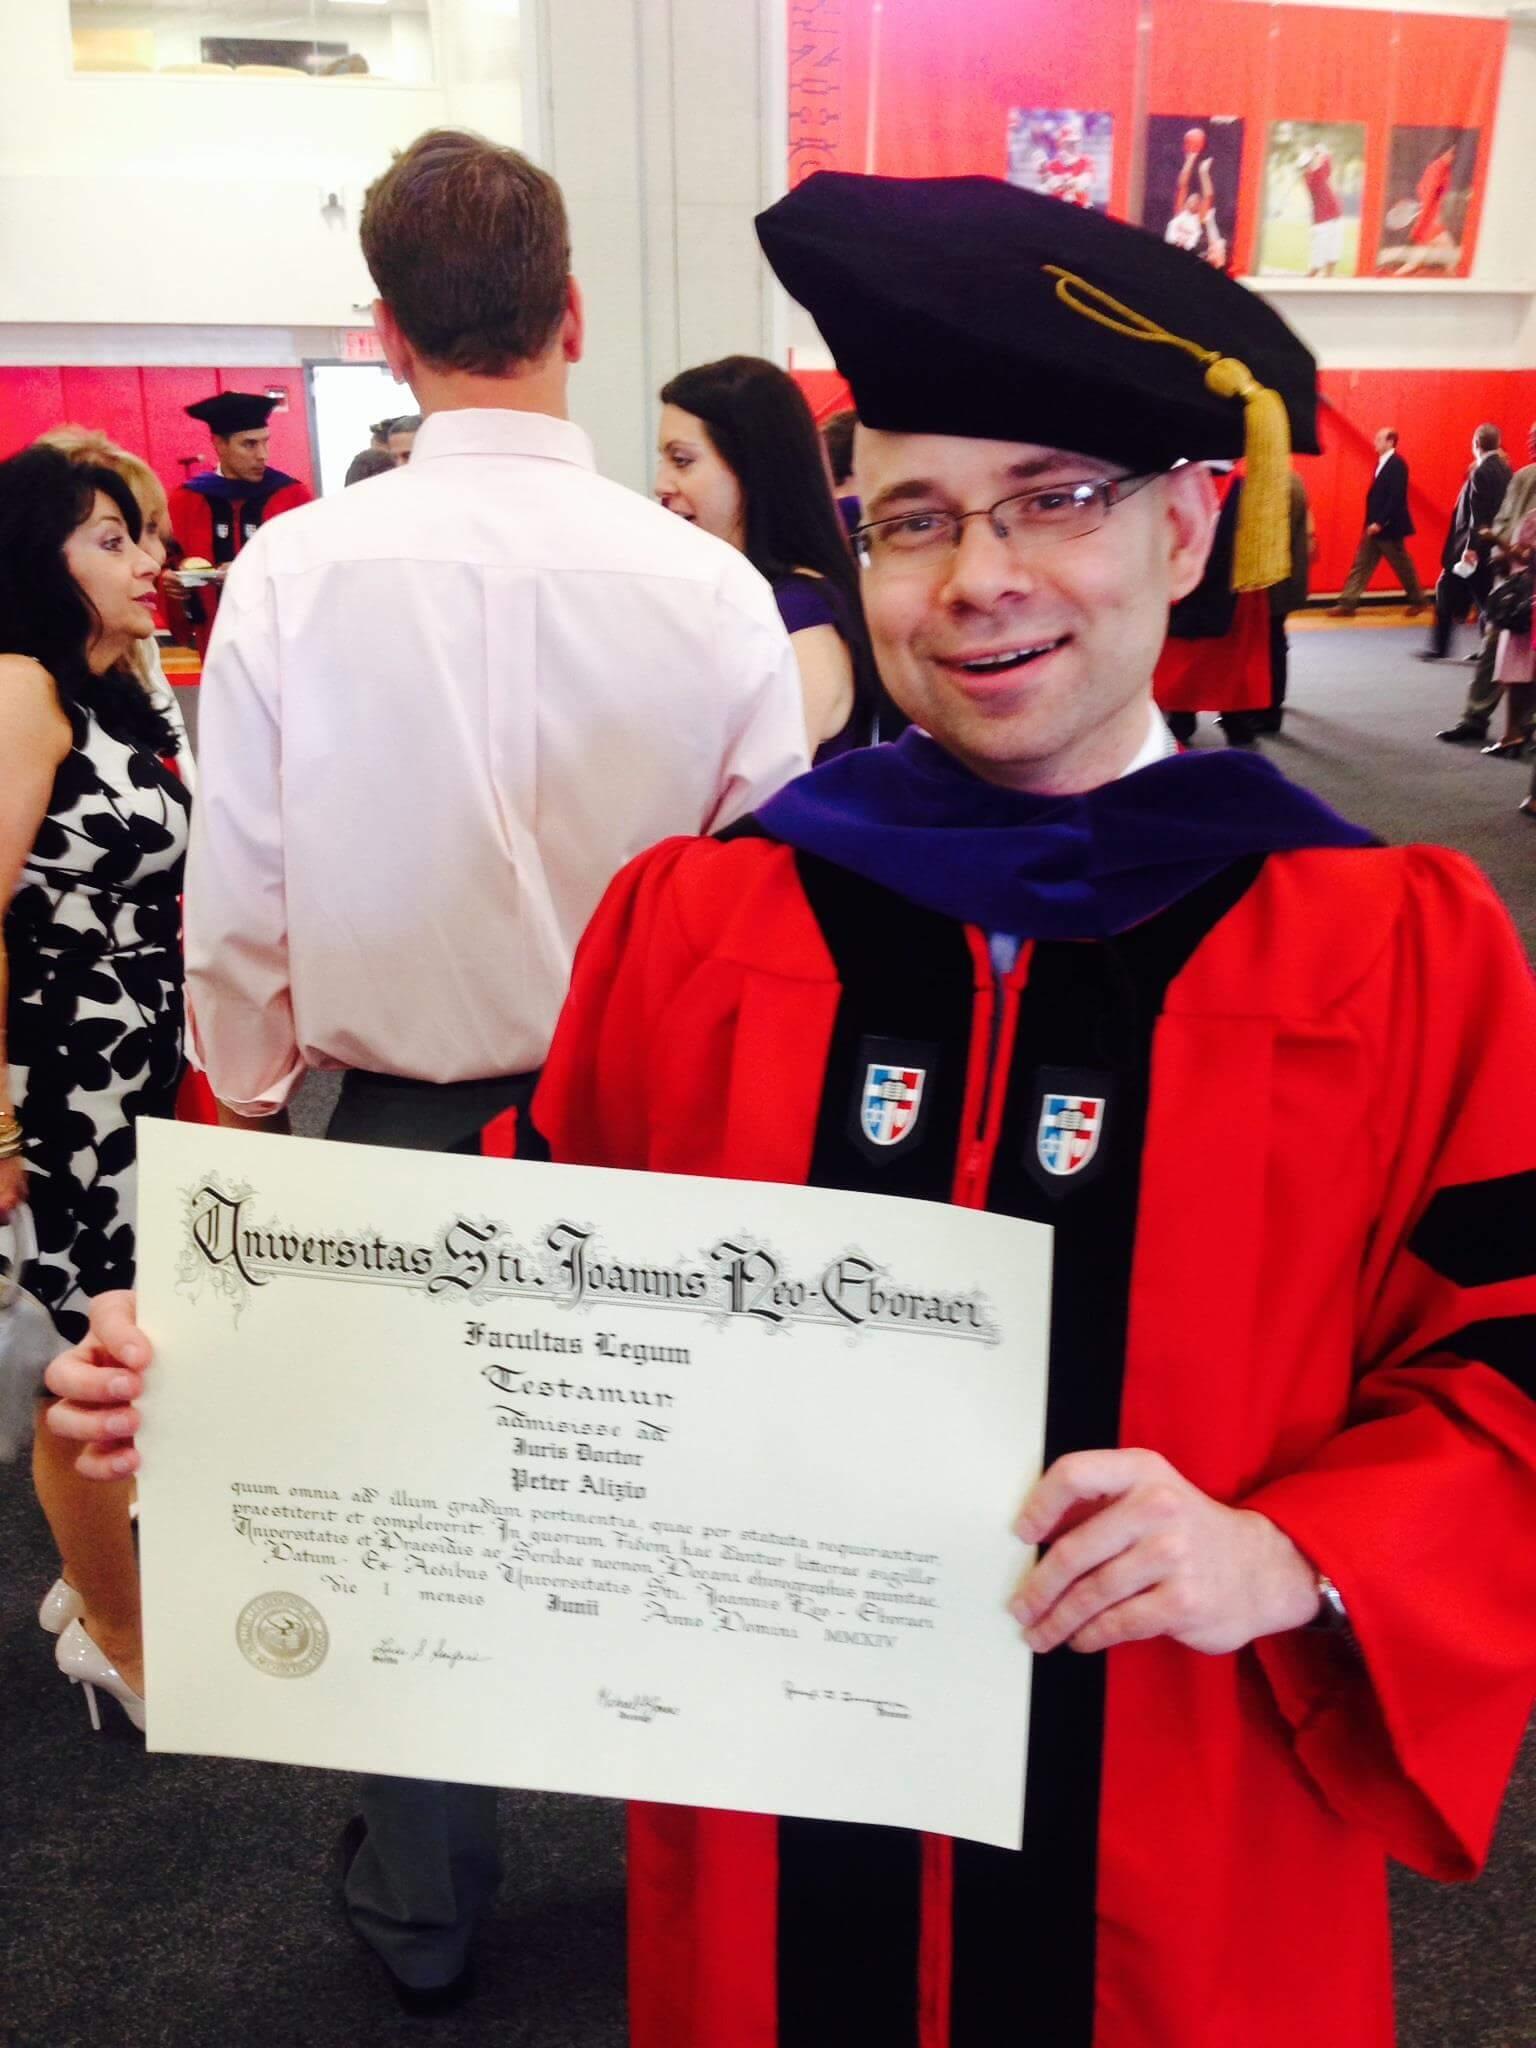 Peter E. Alizio St. John's University School of Law - Class of 2014